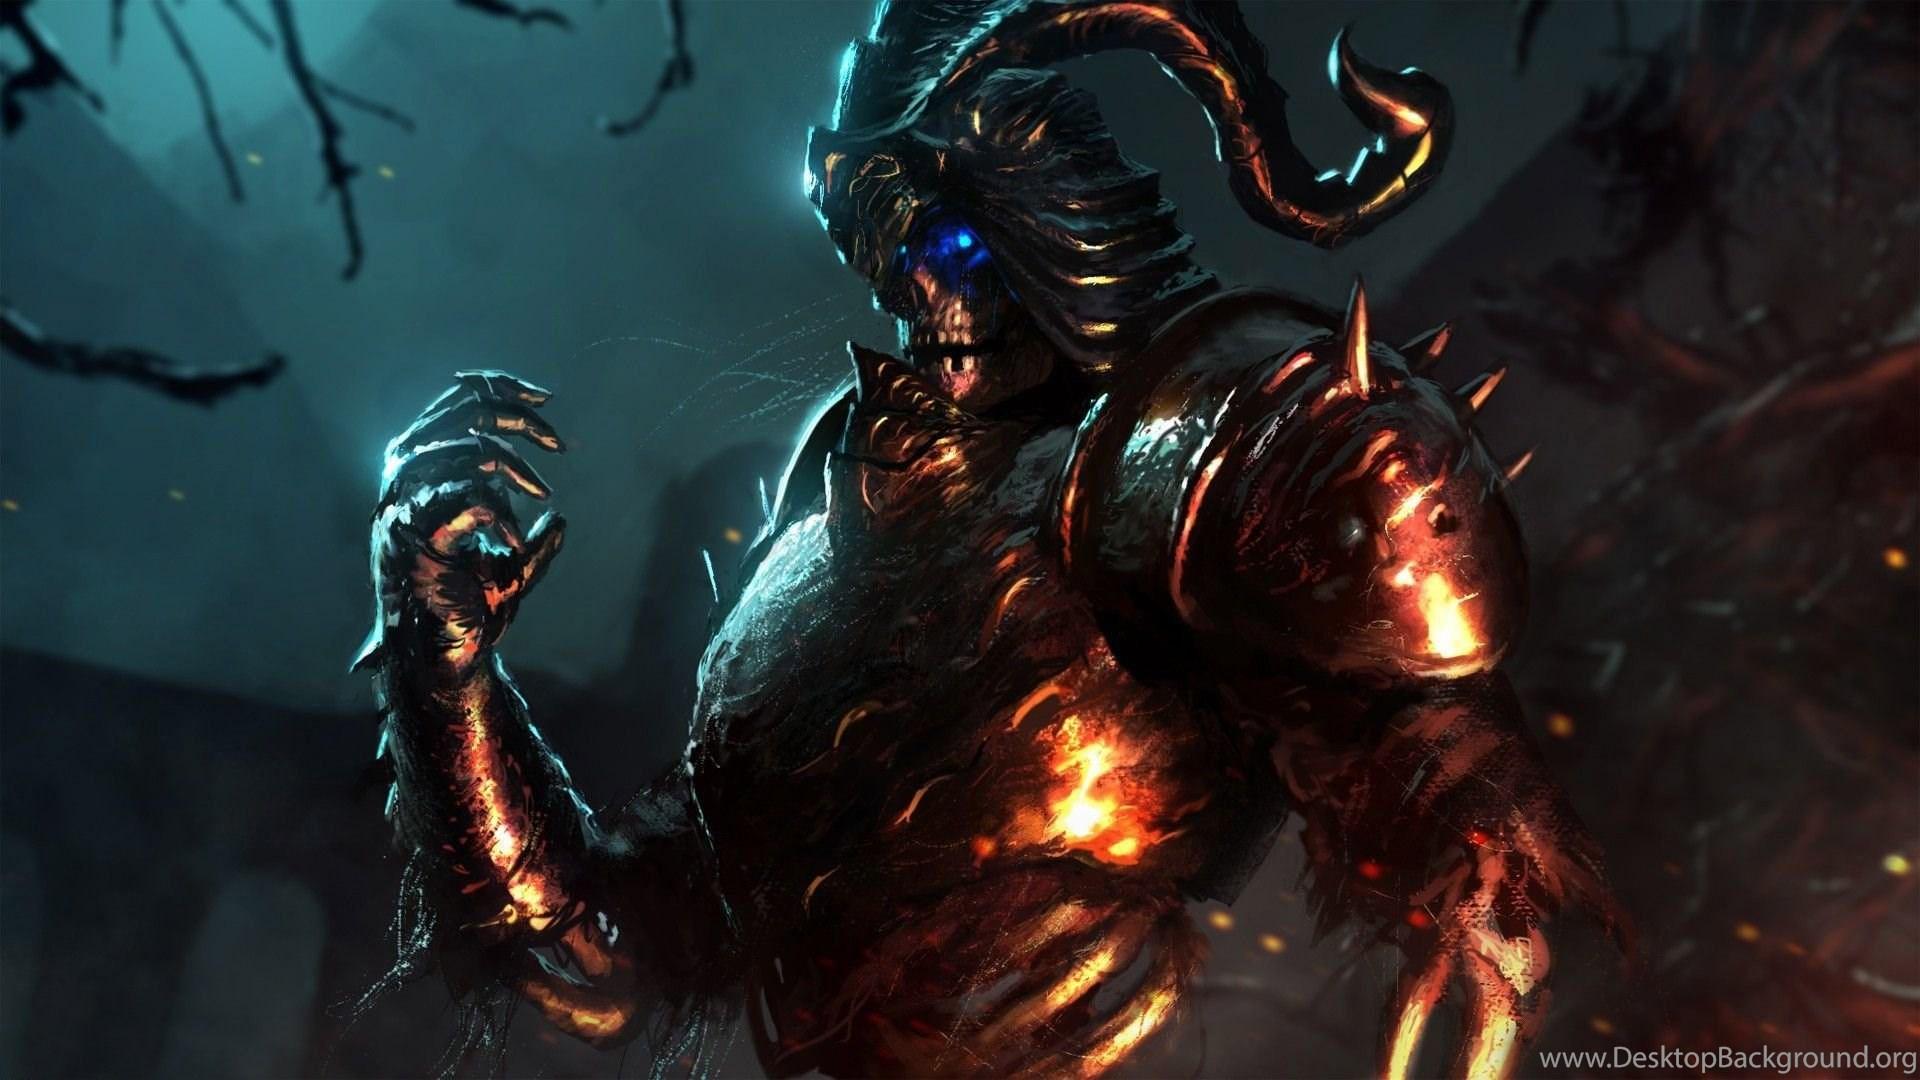 Dark Souls 2 Hd Wallpapers Page 0 Desktop Background